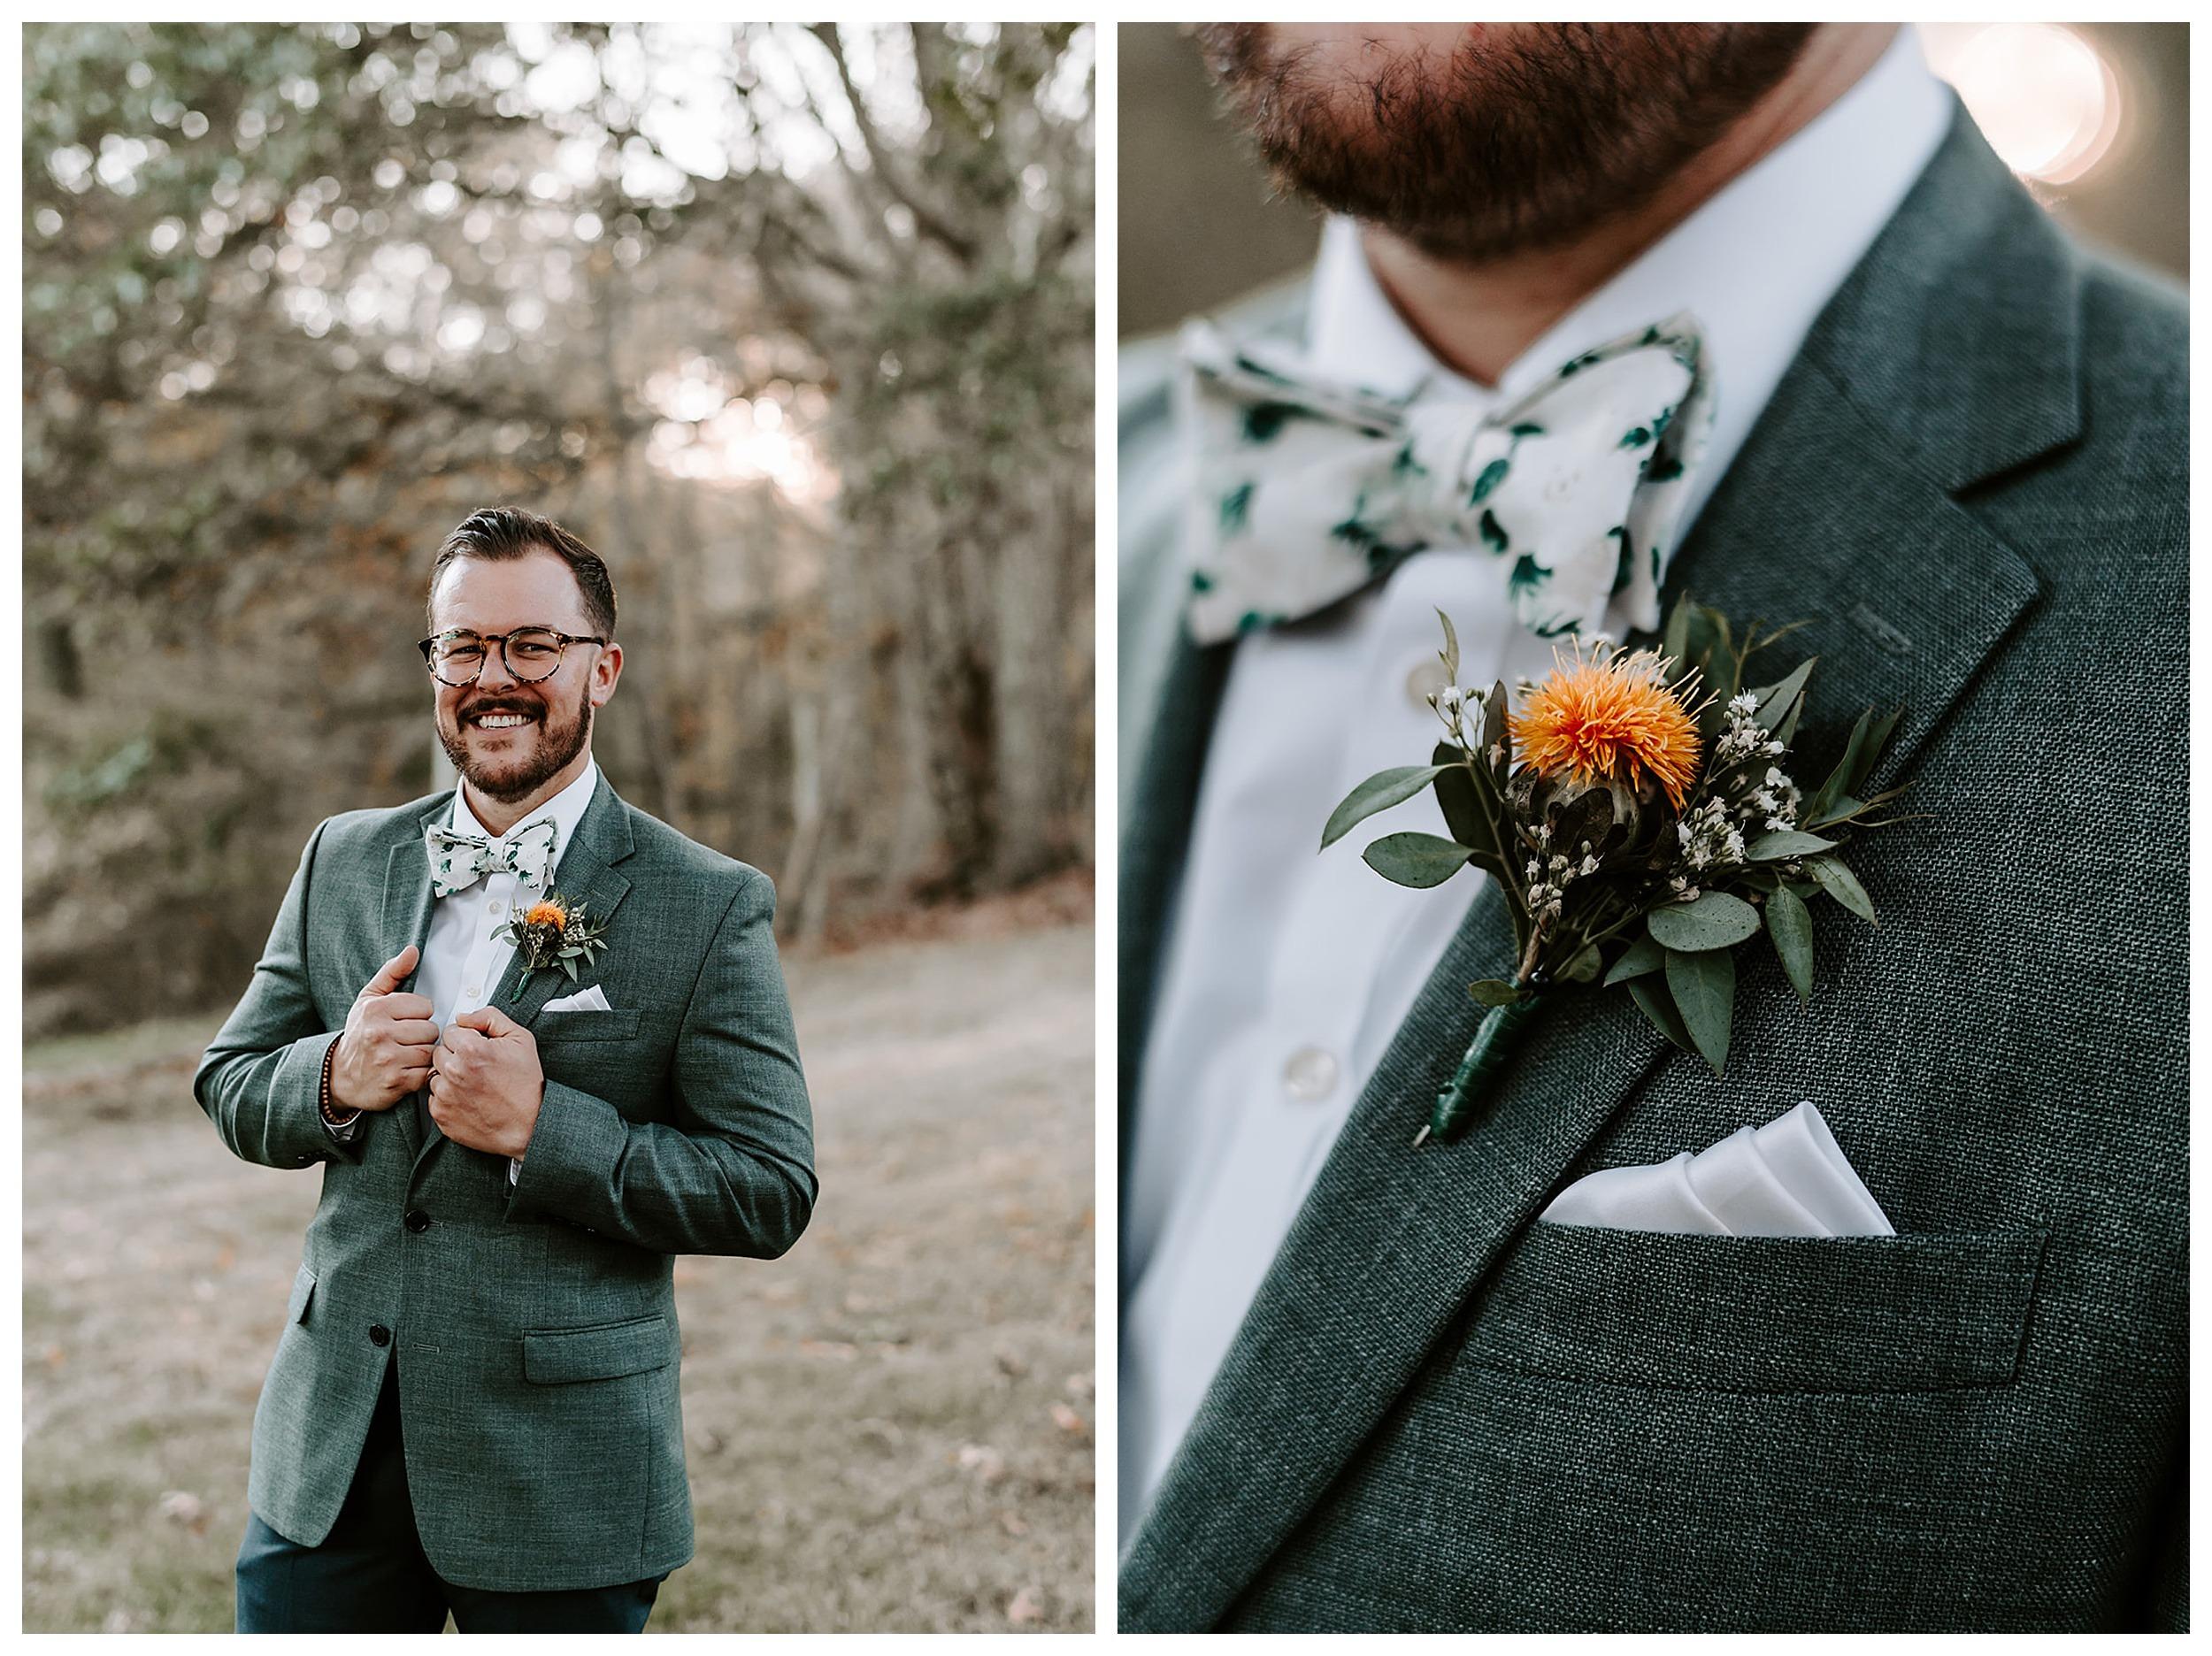 groom wearing green suit